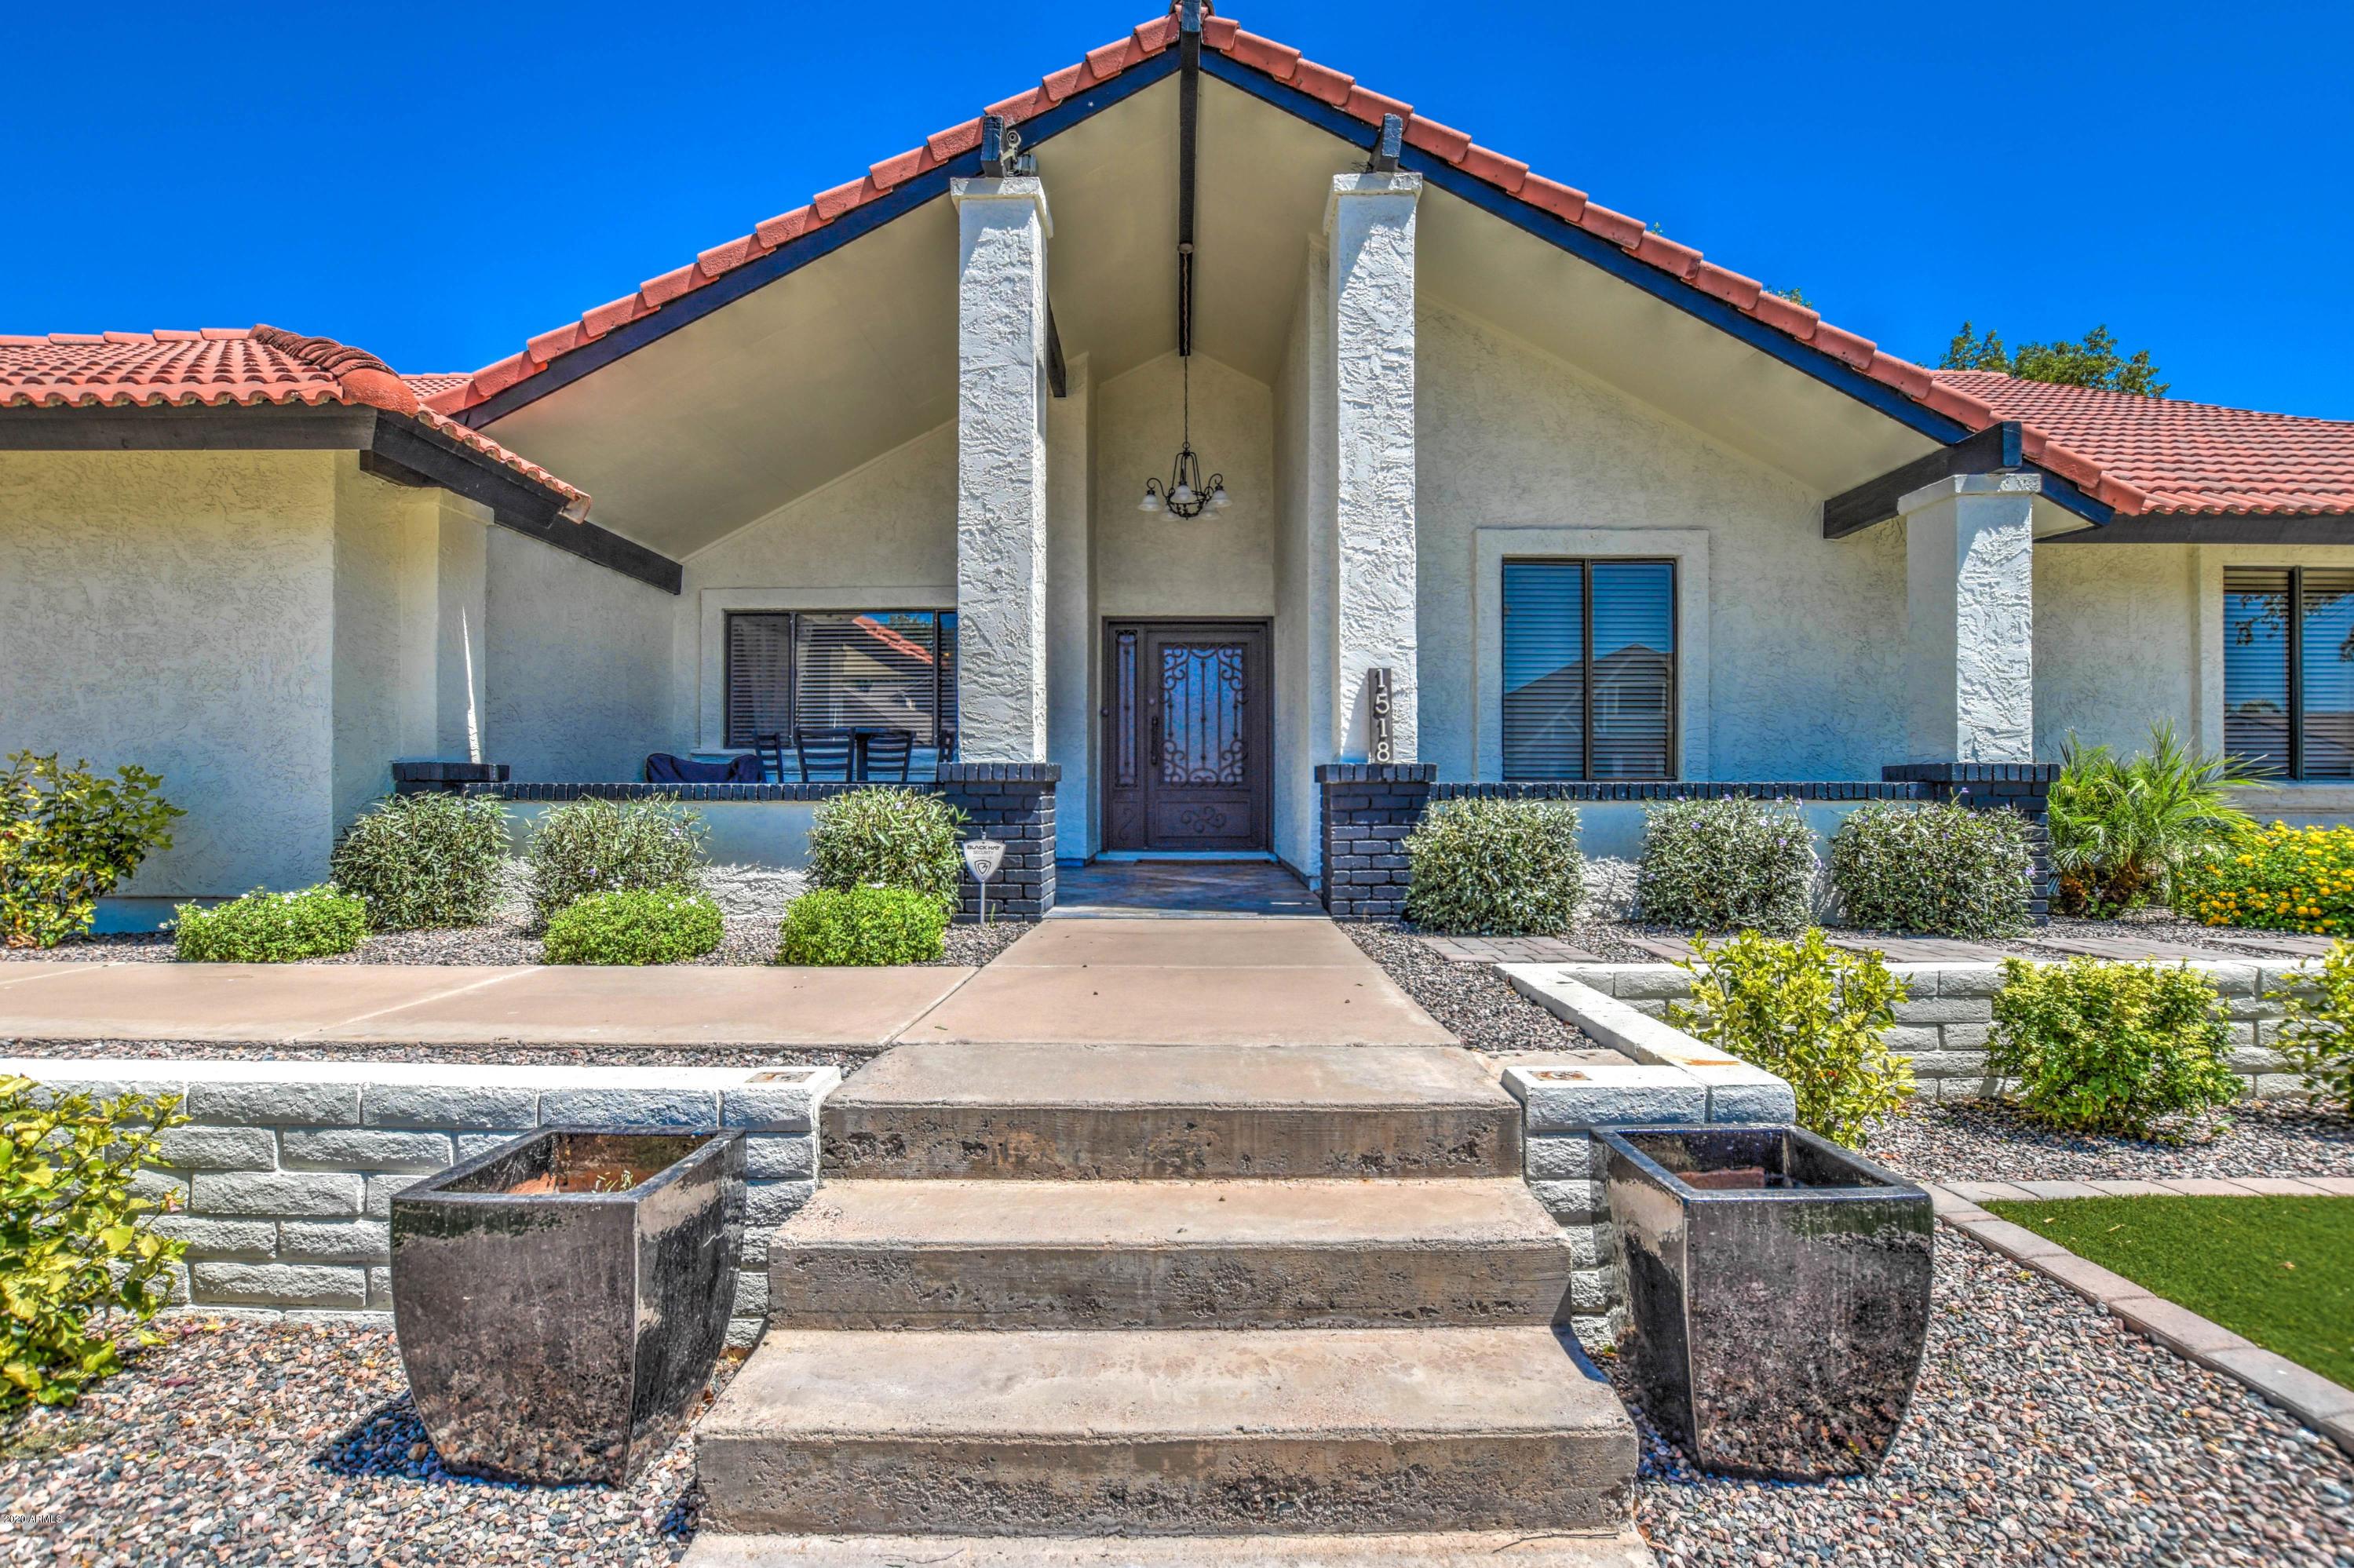 Photo of 1518 E LYNWOOD Street, Mesa, AZ 85203